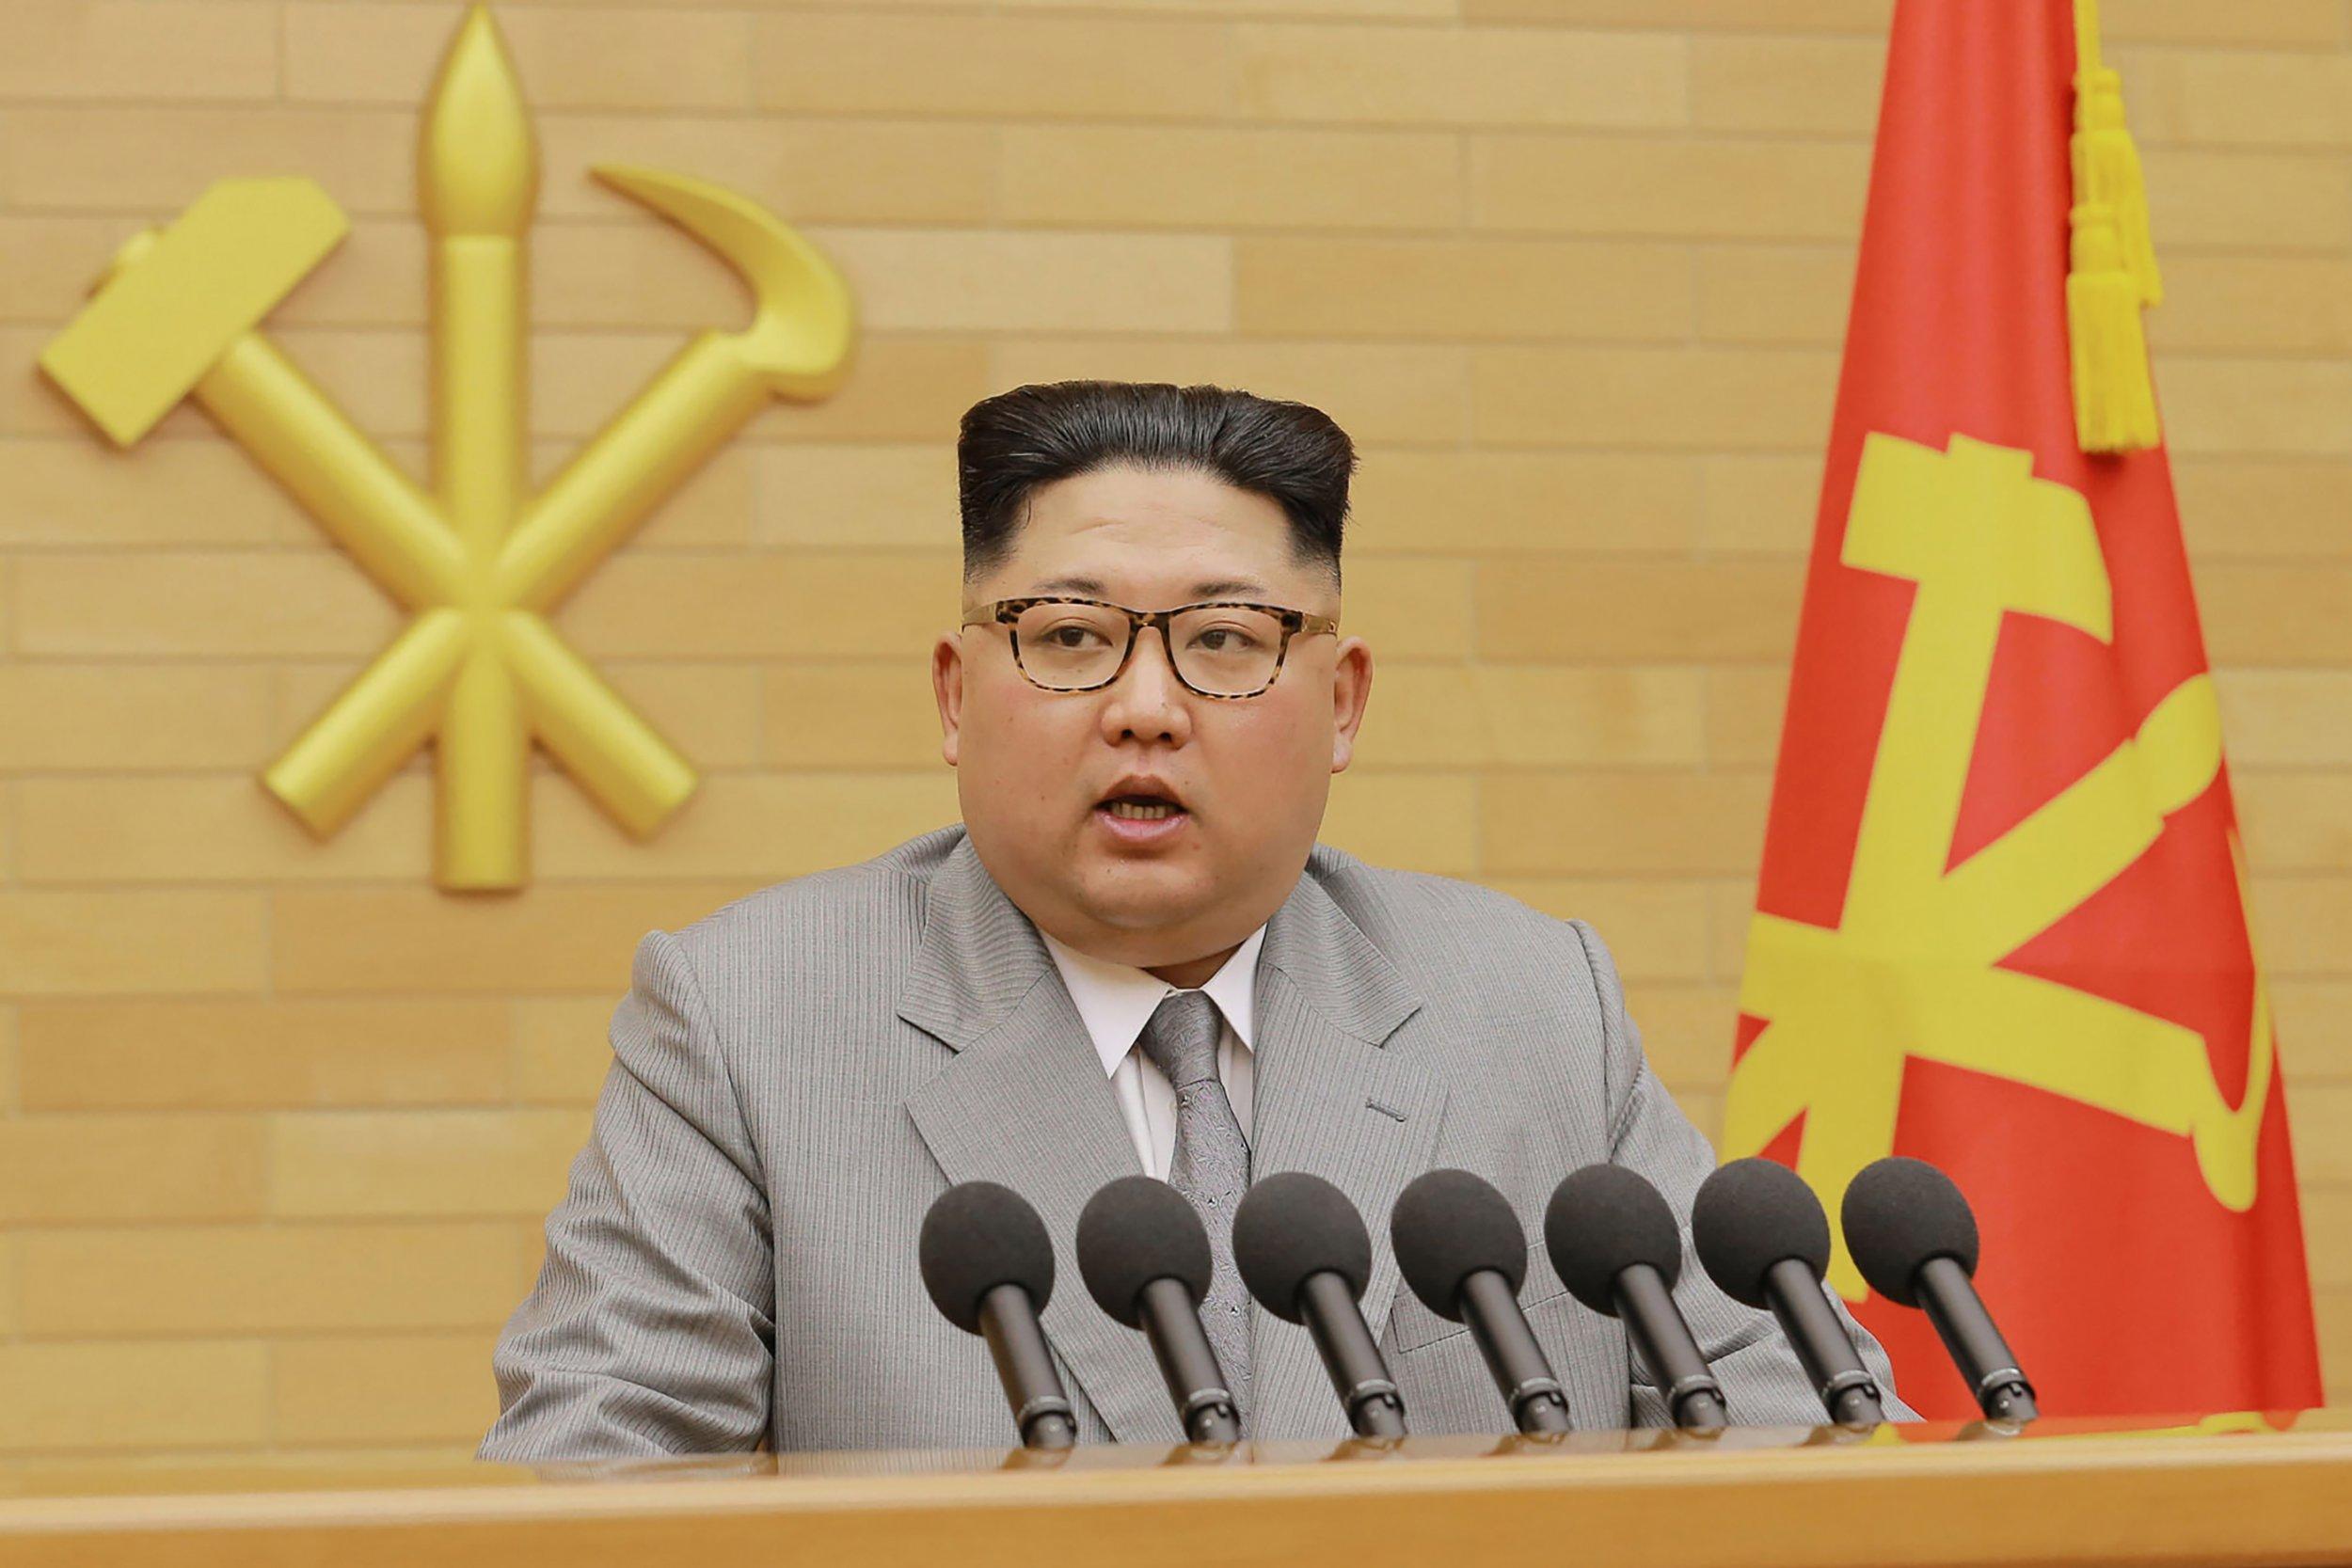 02_02_North_Korea_